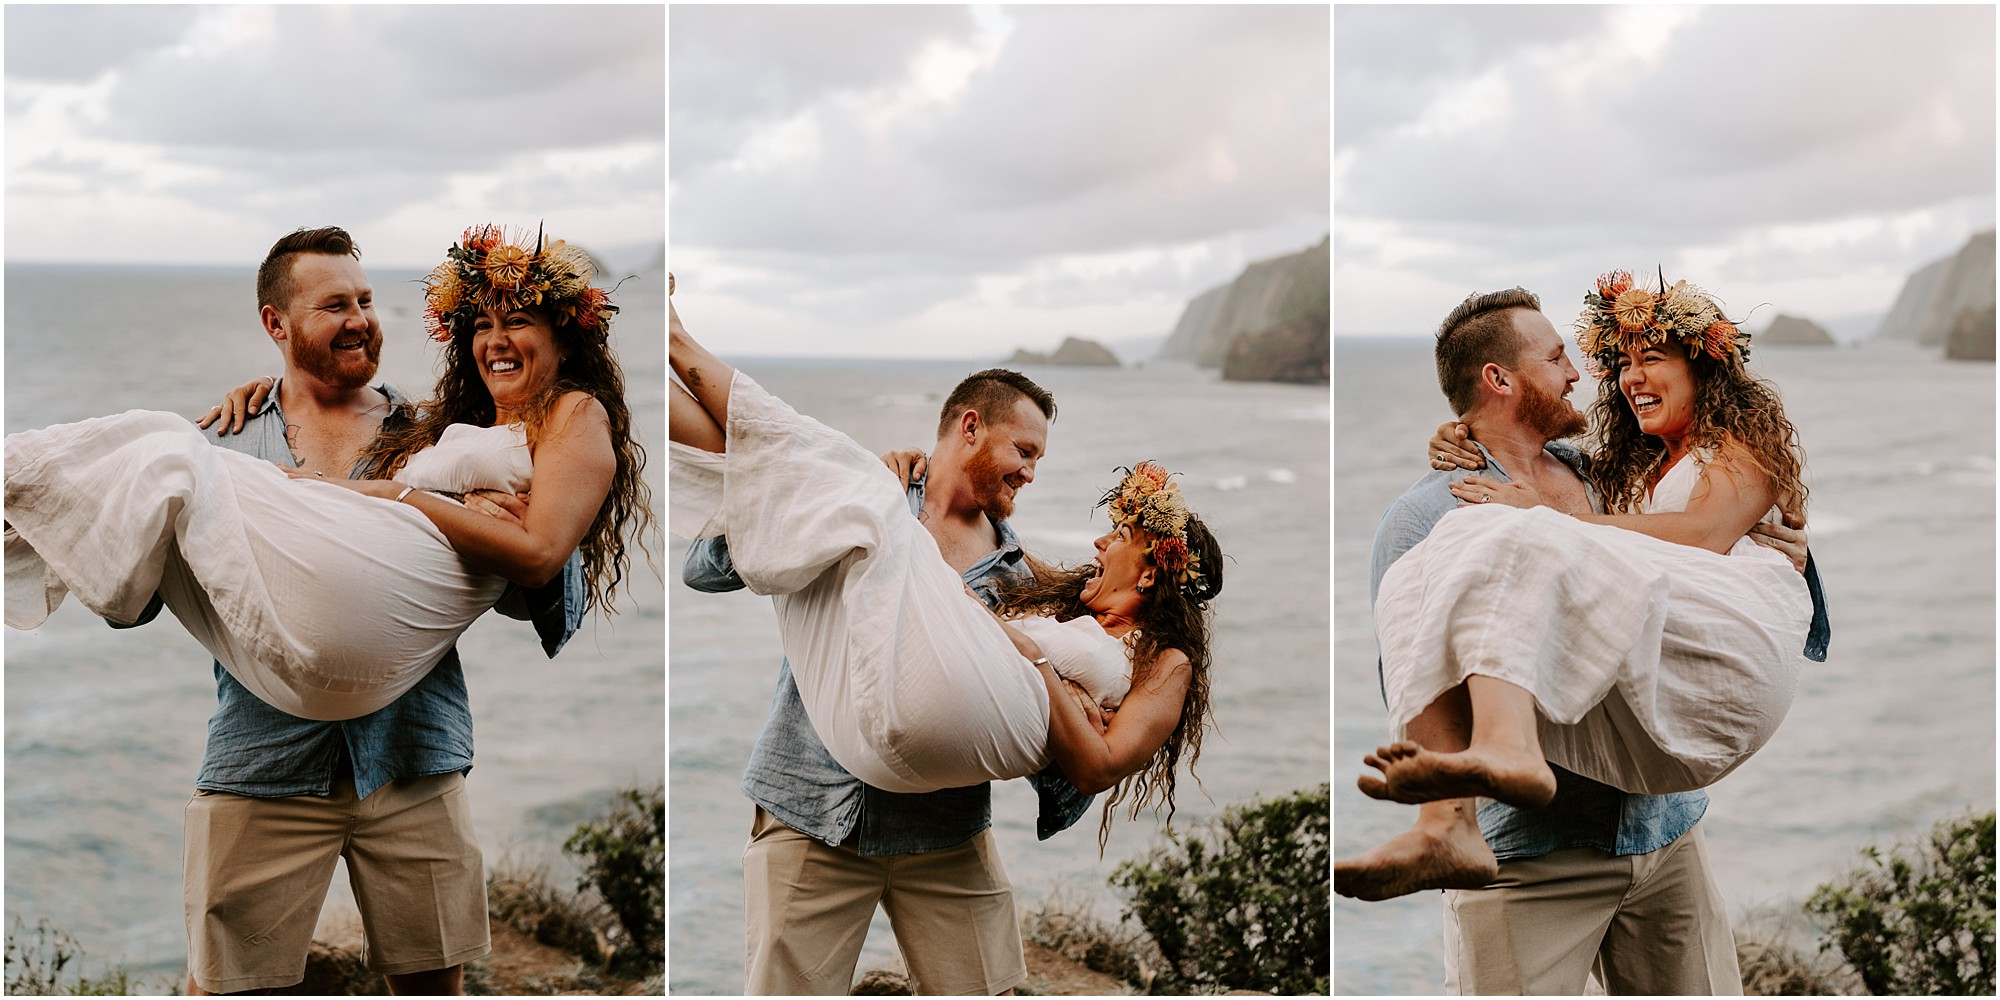 big-island-valley-proposal-hawaii-elopement-photographer_0051.jpg